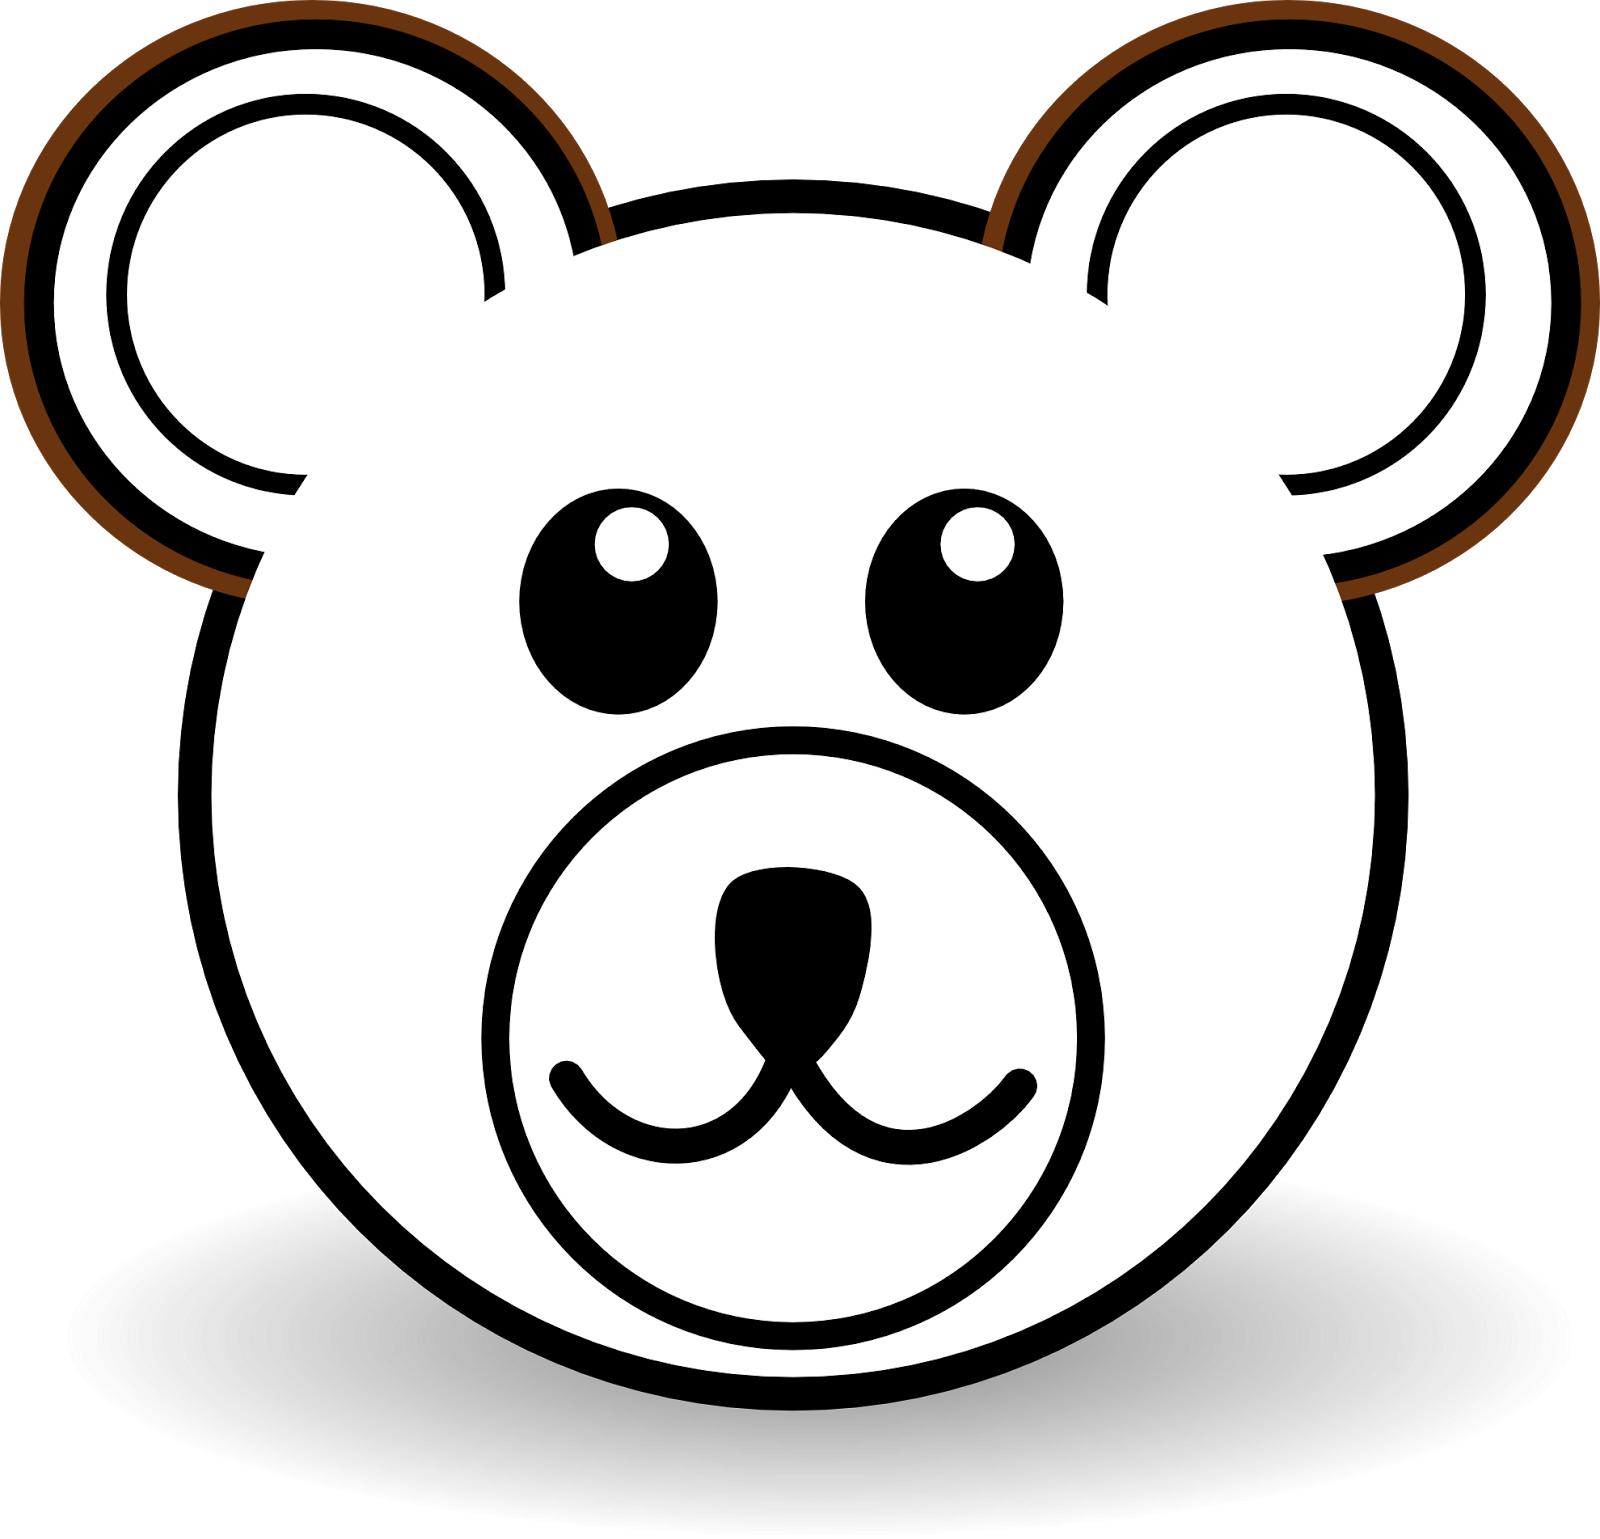 1600x1539 Easy Bear Drawing Clip Art For Free Download On Mbtskoudsalg